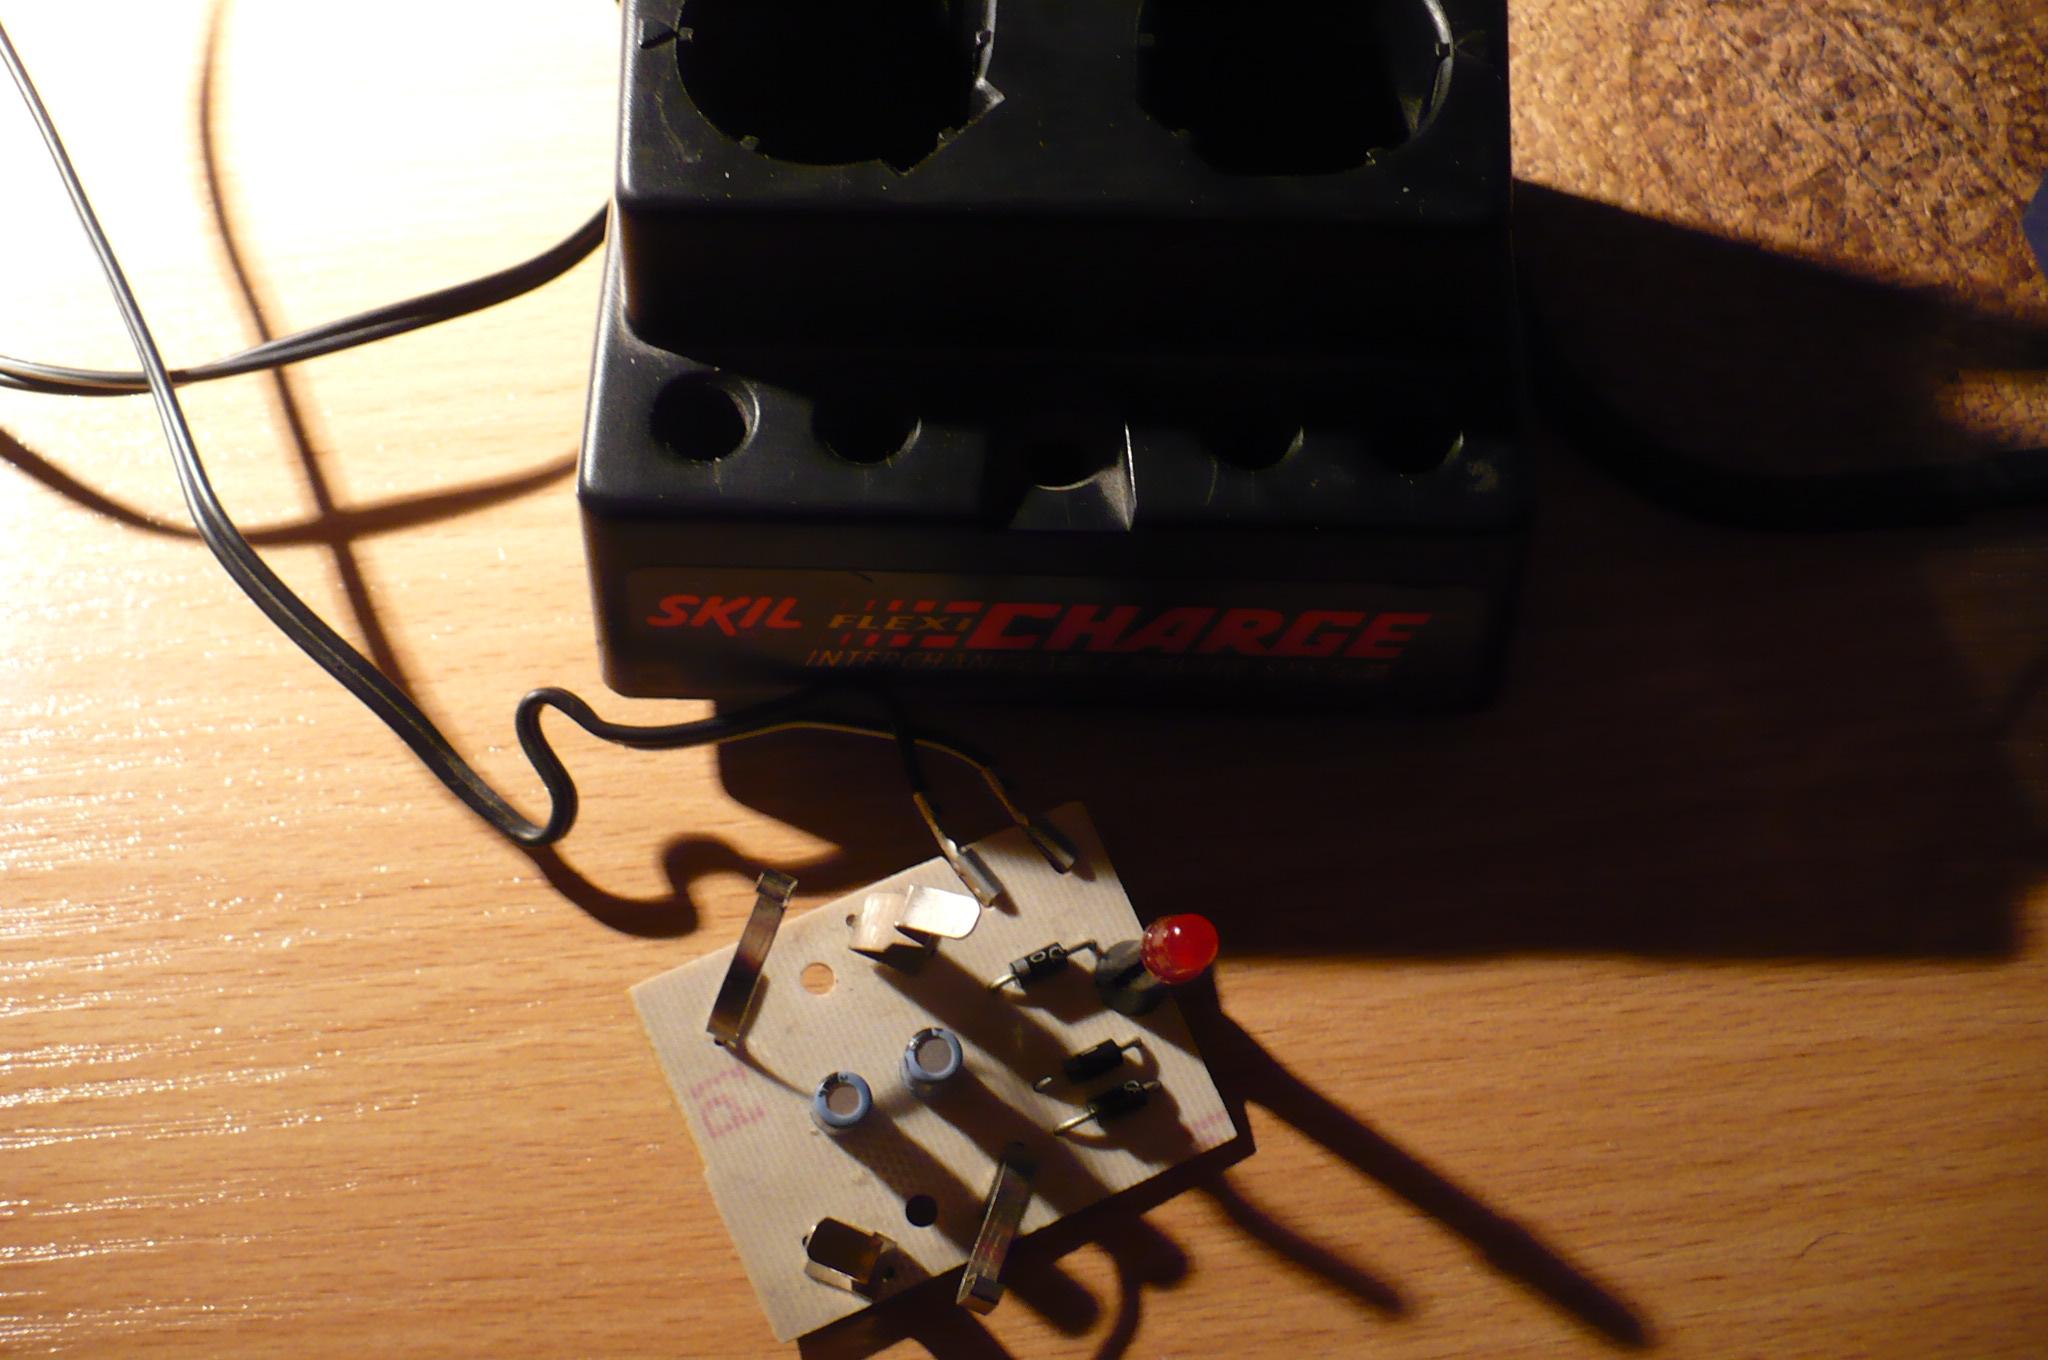 Spalony transormator �adowarki wkr�tarka aku. skil 2136u1 model f0152136a1